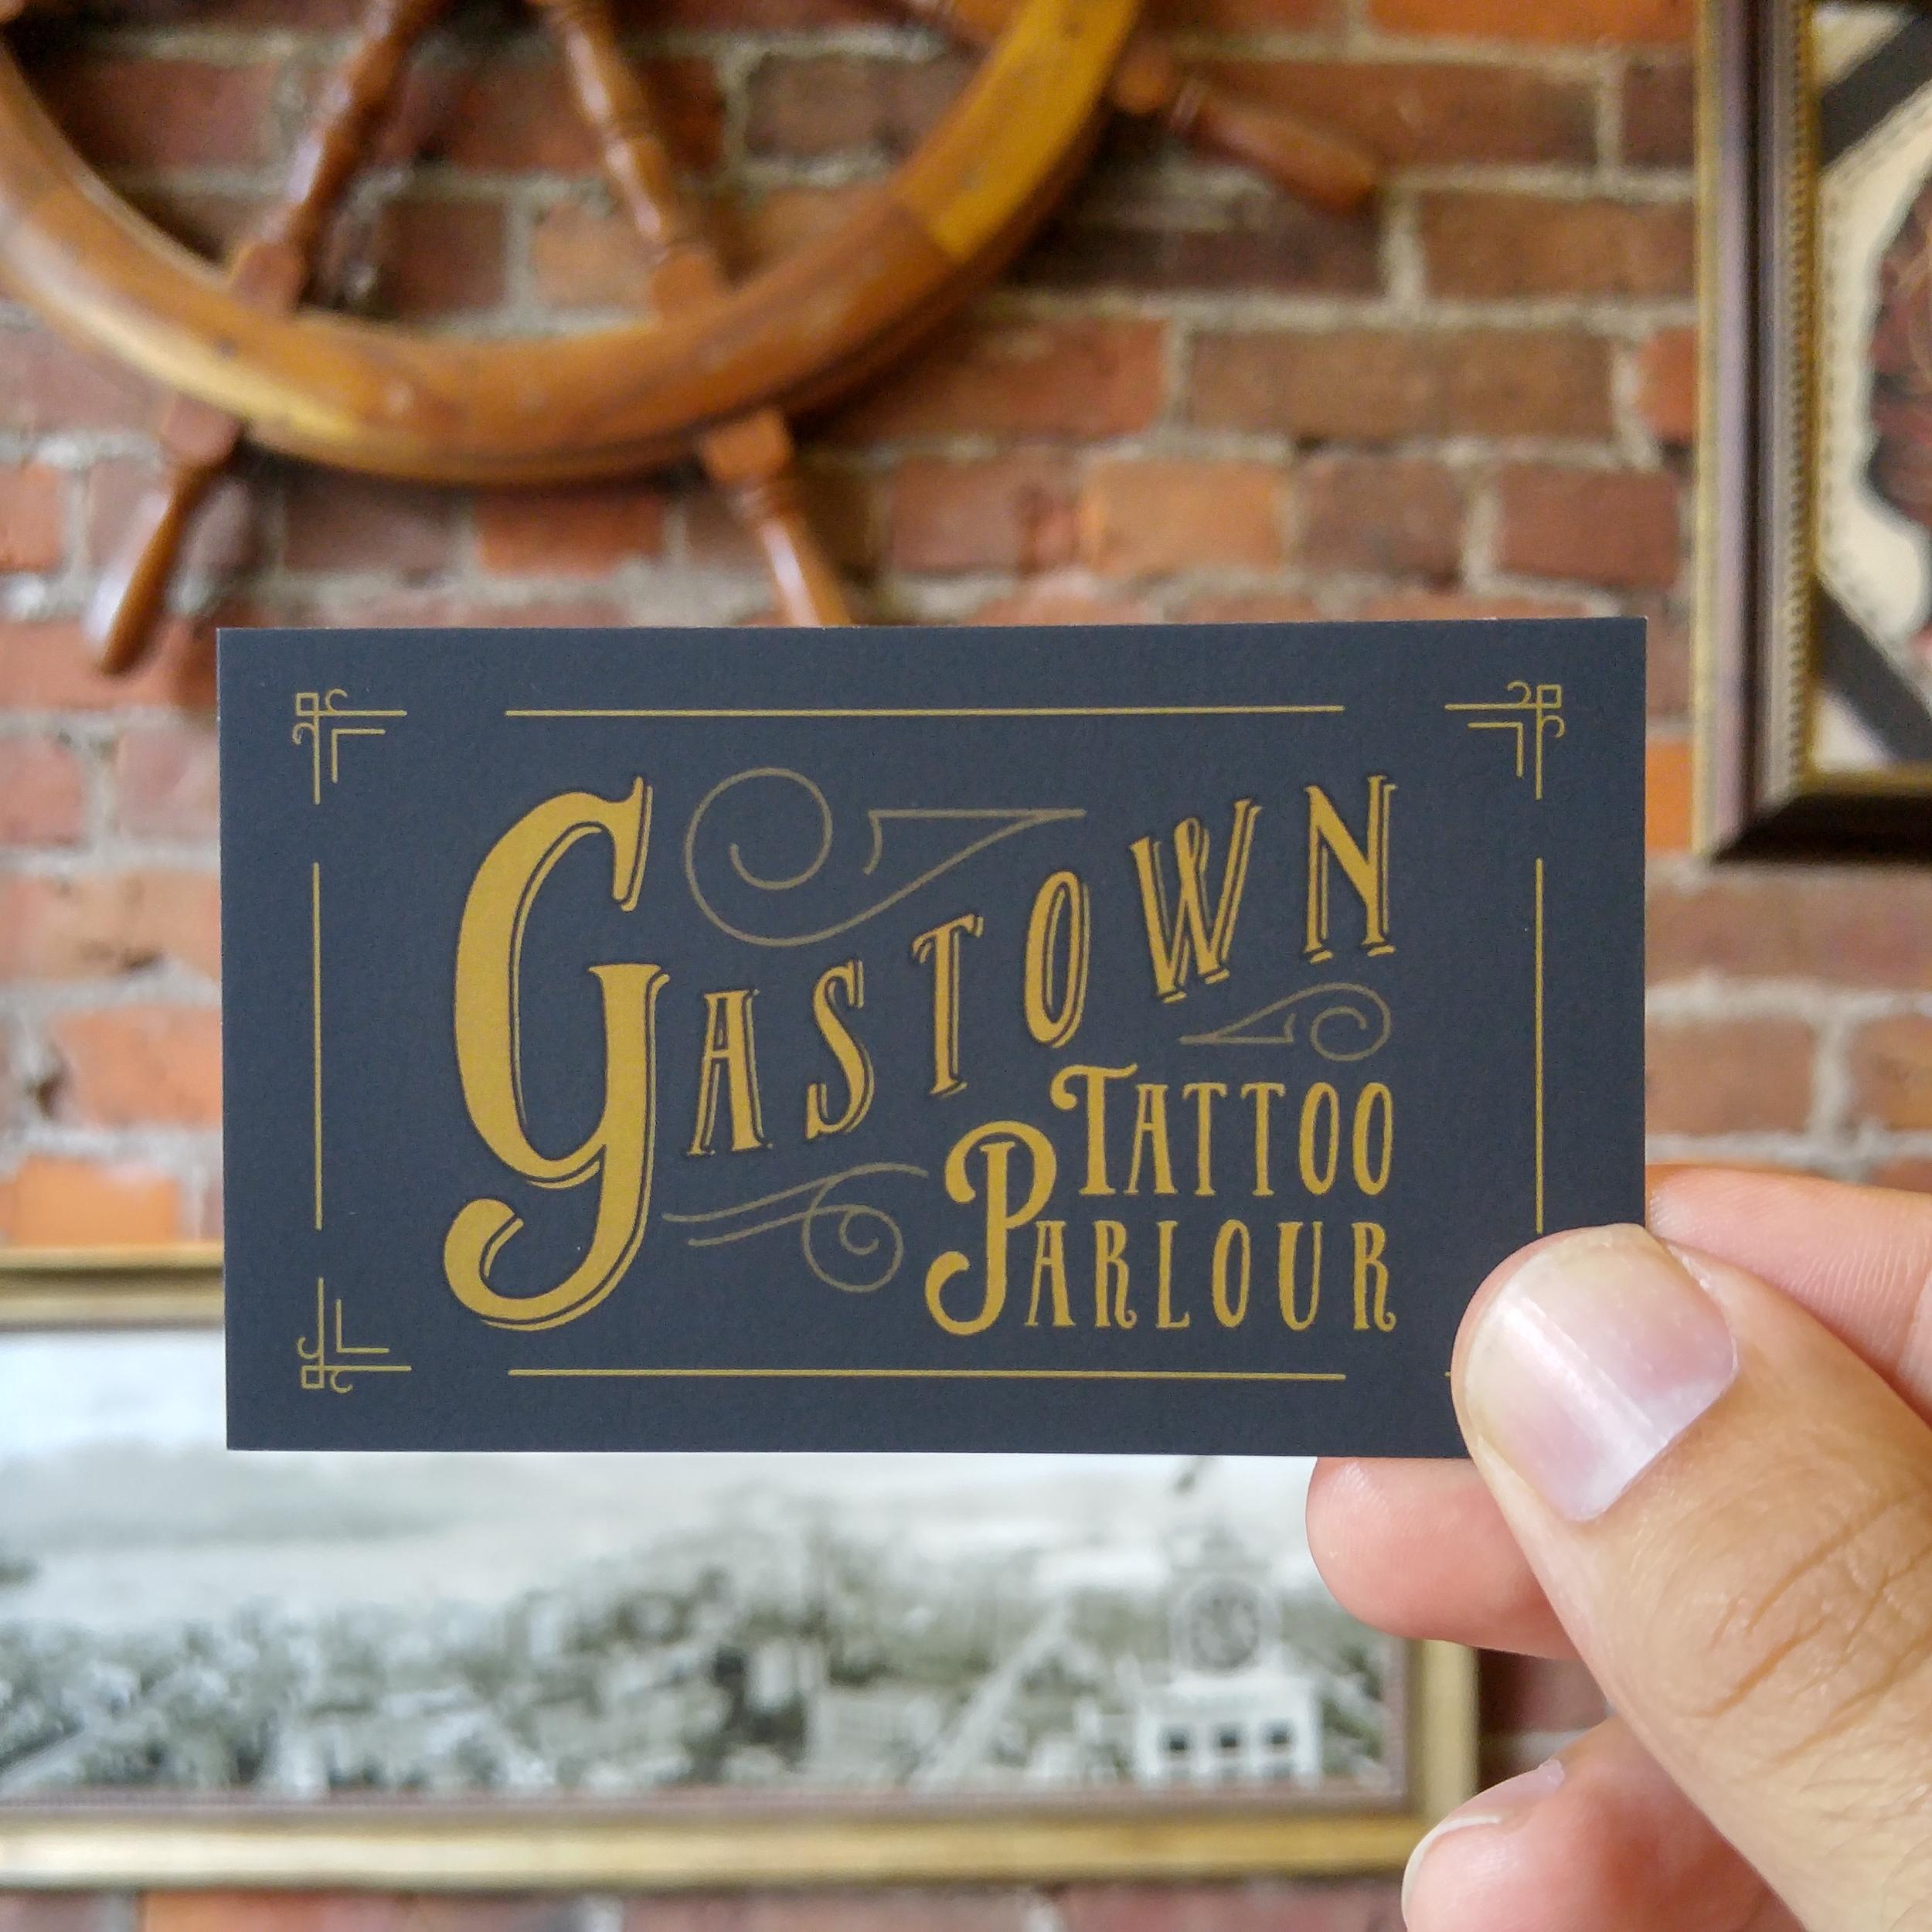 Next stop, Gastown.